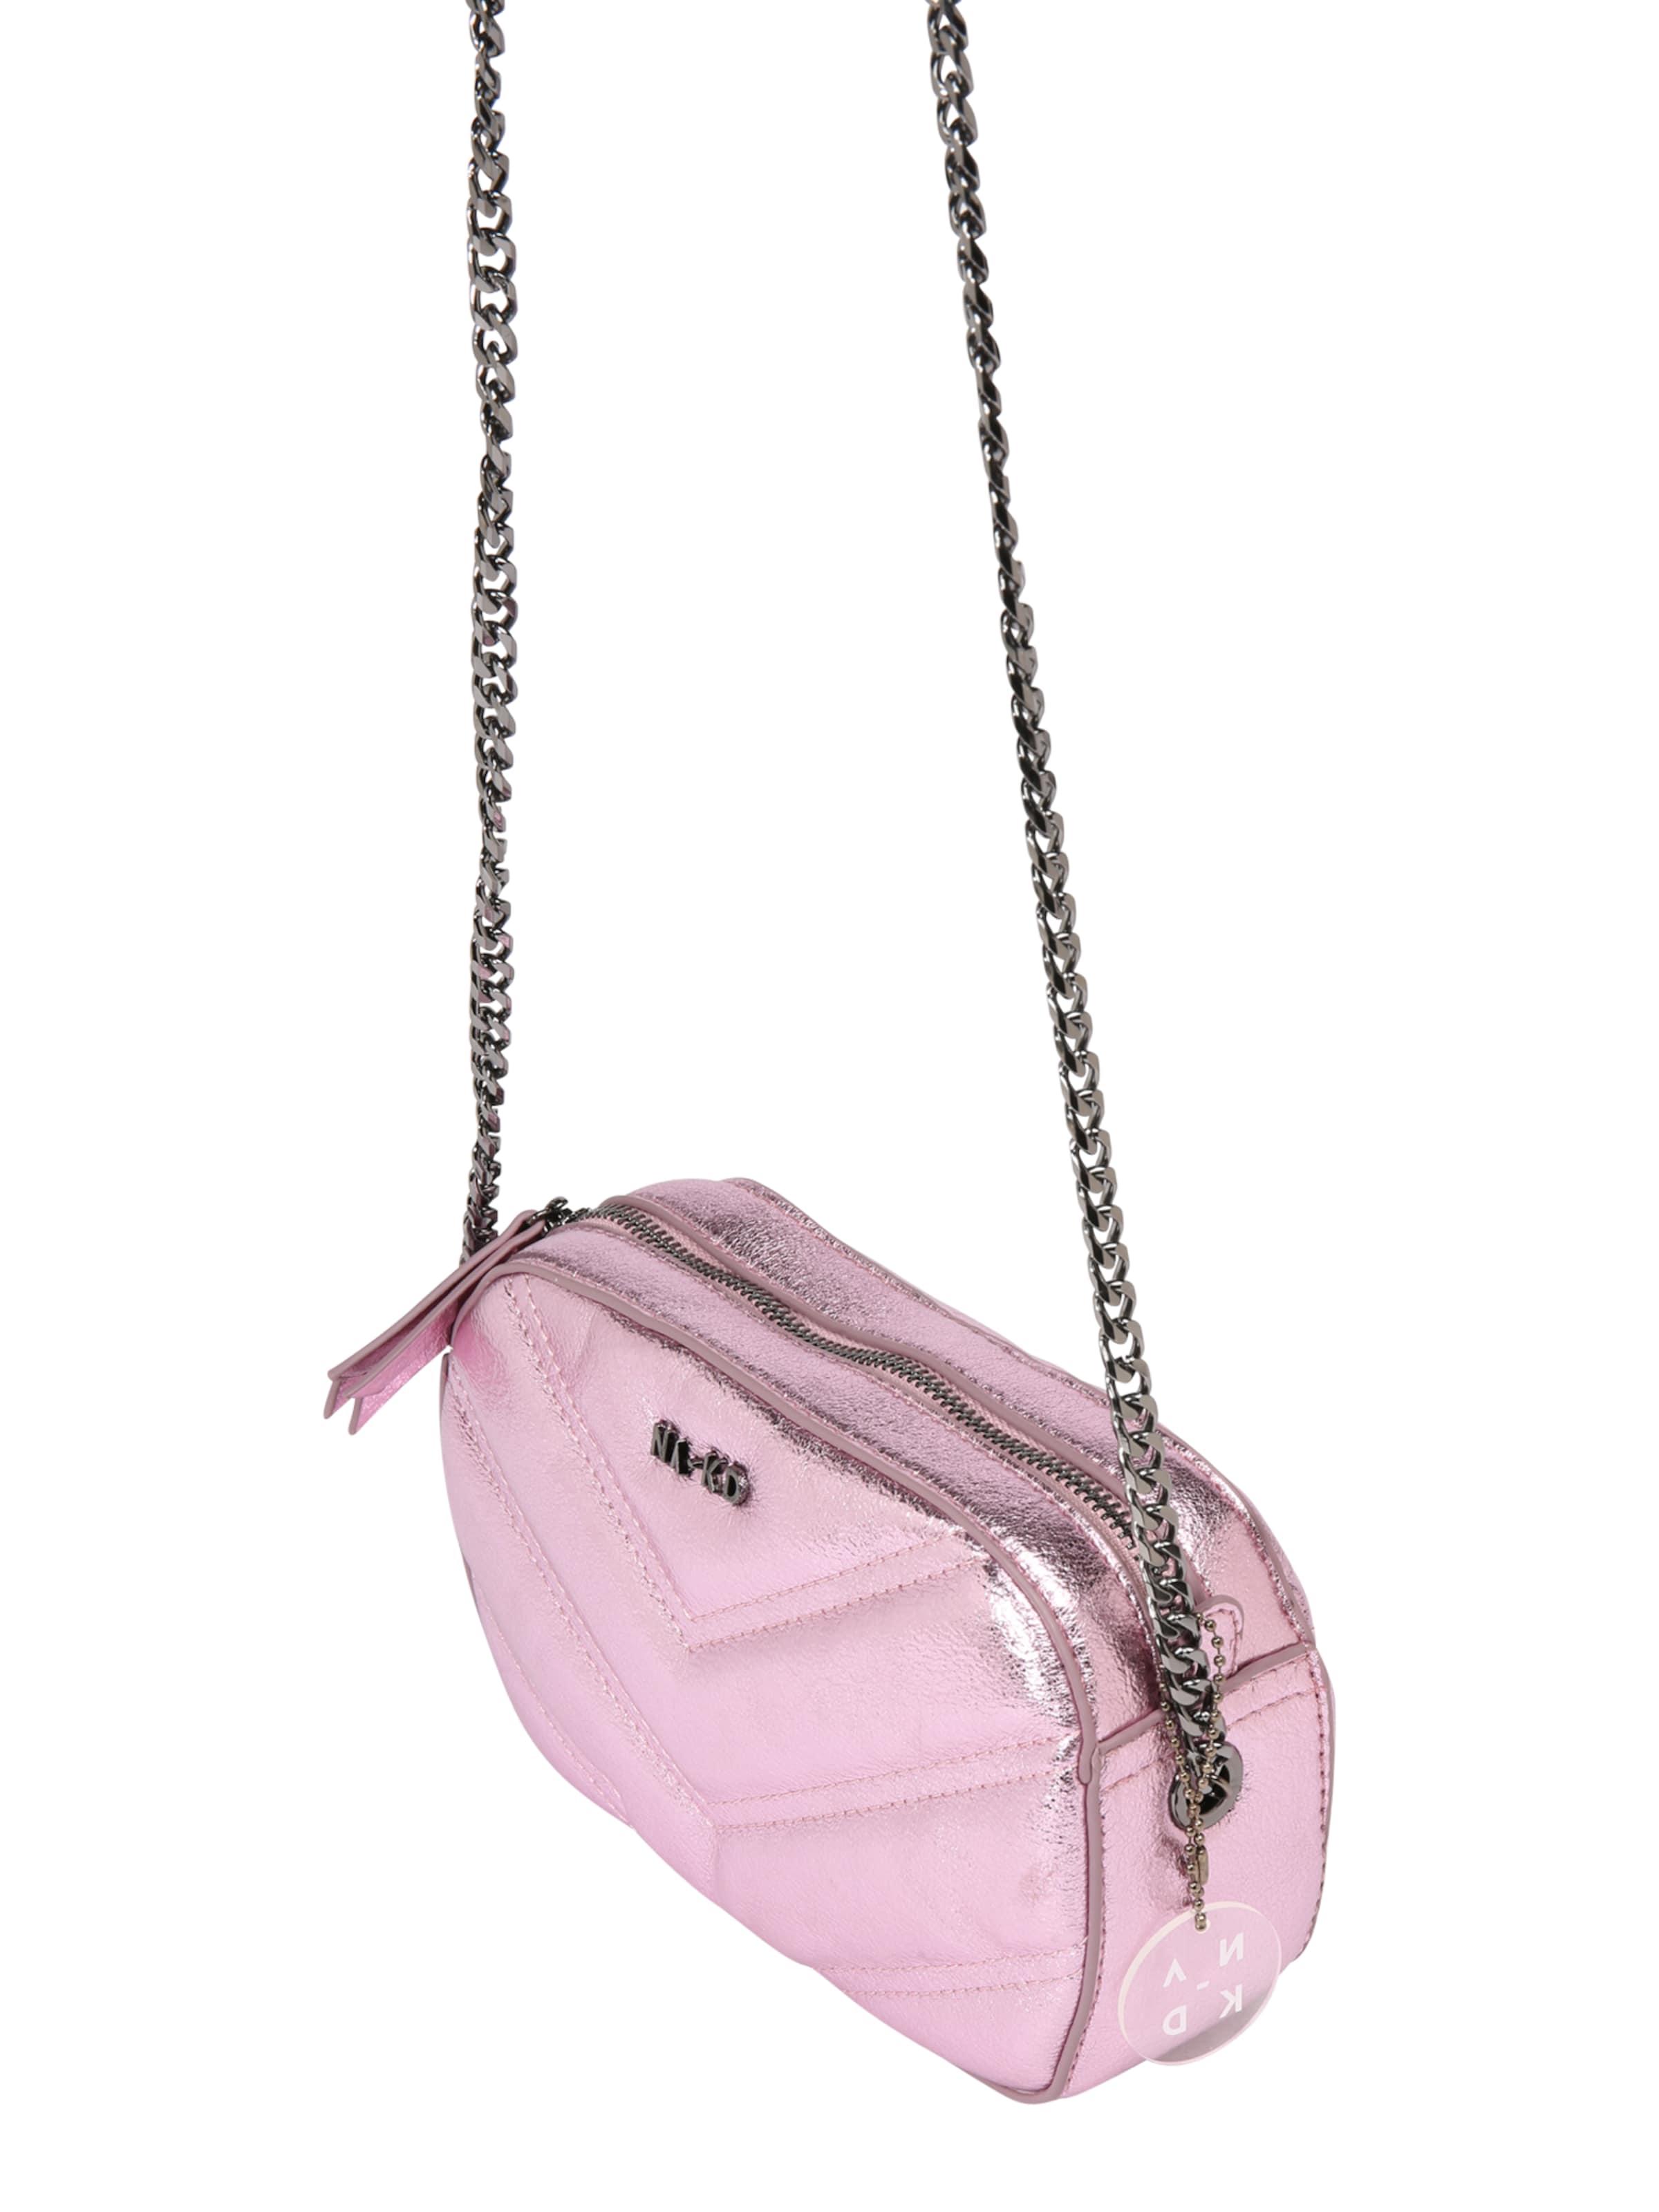 Na En Sac Shoulder À Noir Bandoulière kd 'quilted Bag' OnwP0k